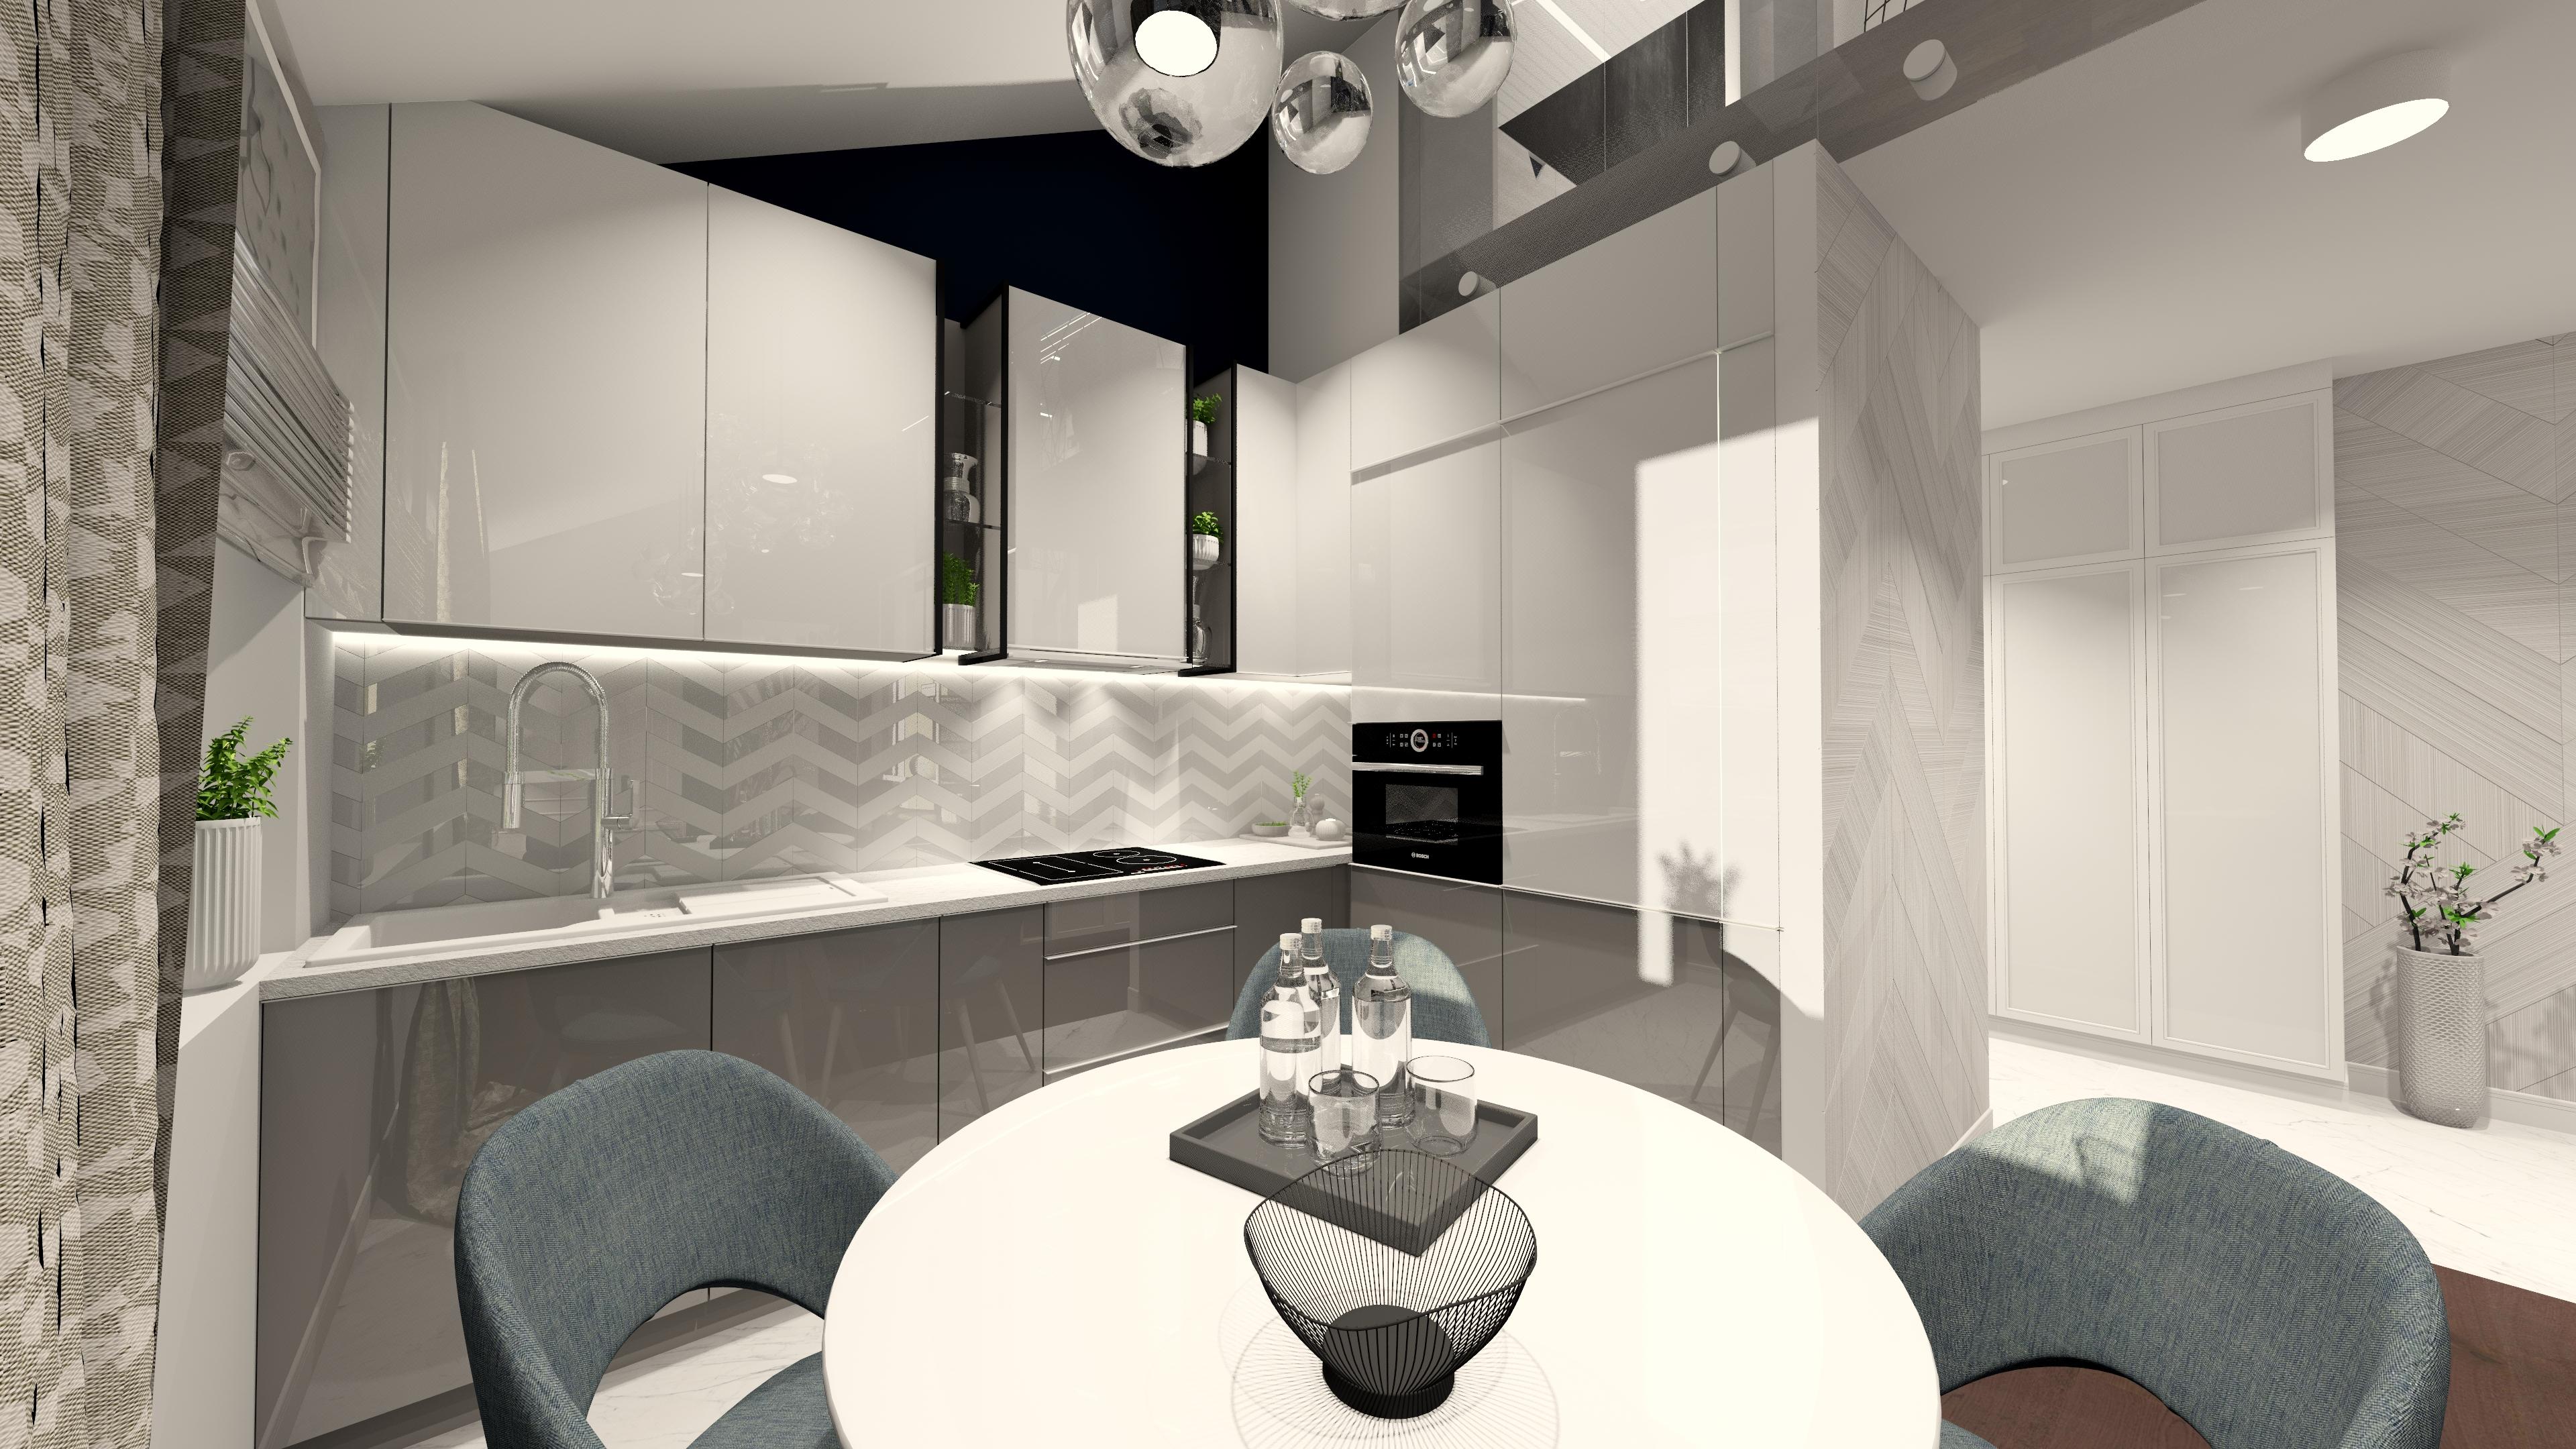 projektantpulawy-pulawy-czapla-interior-design-entresol-modern-steel-small-room-kitchenROZ5